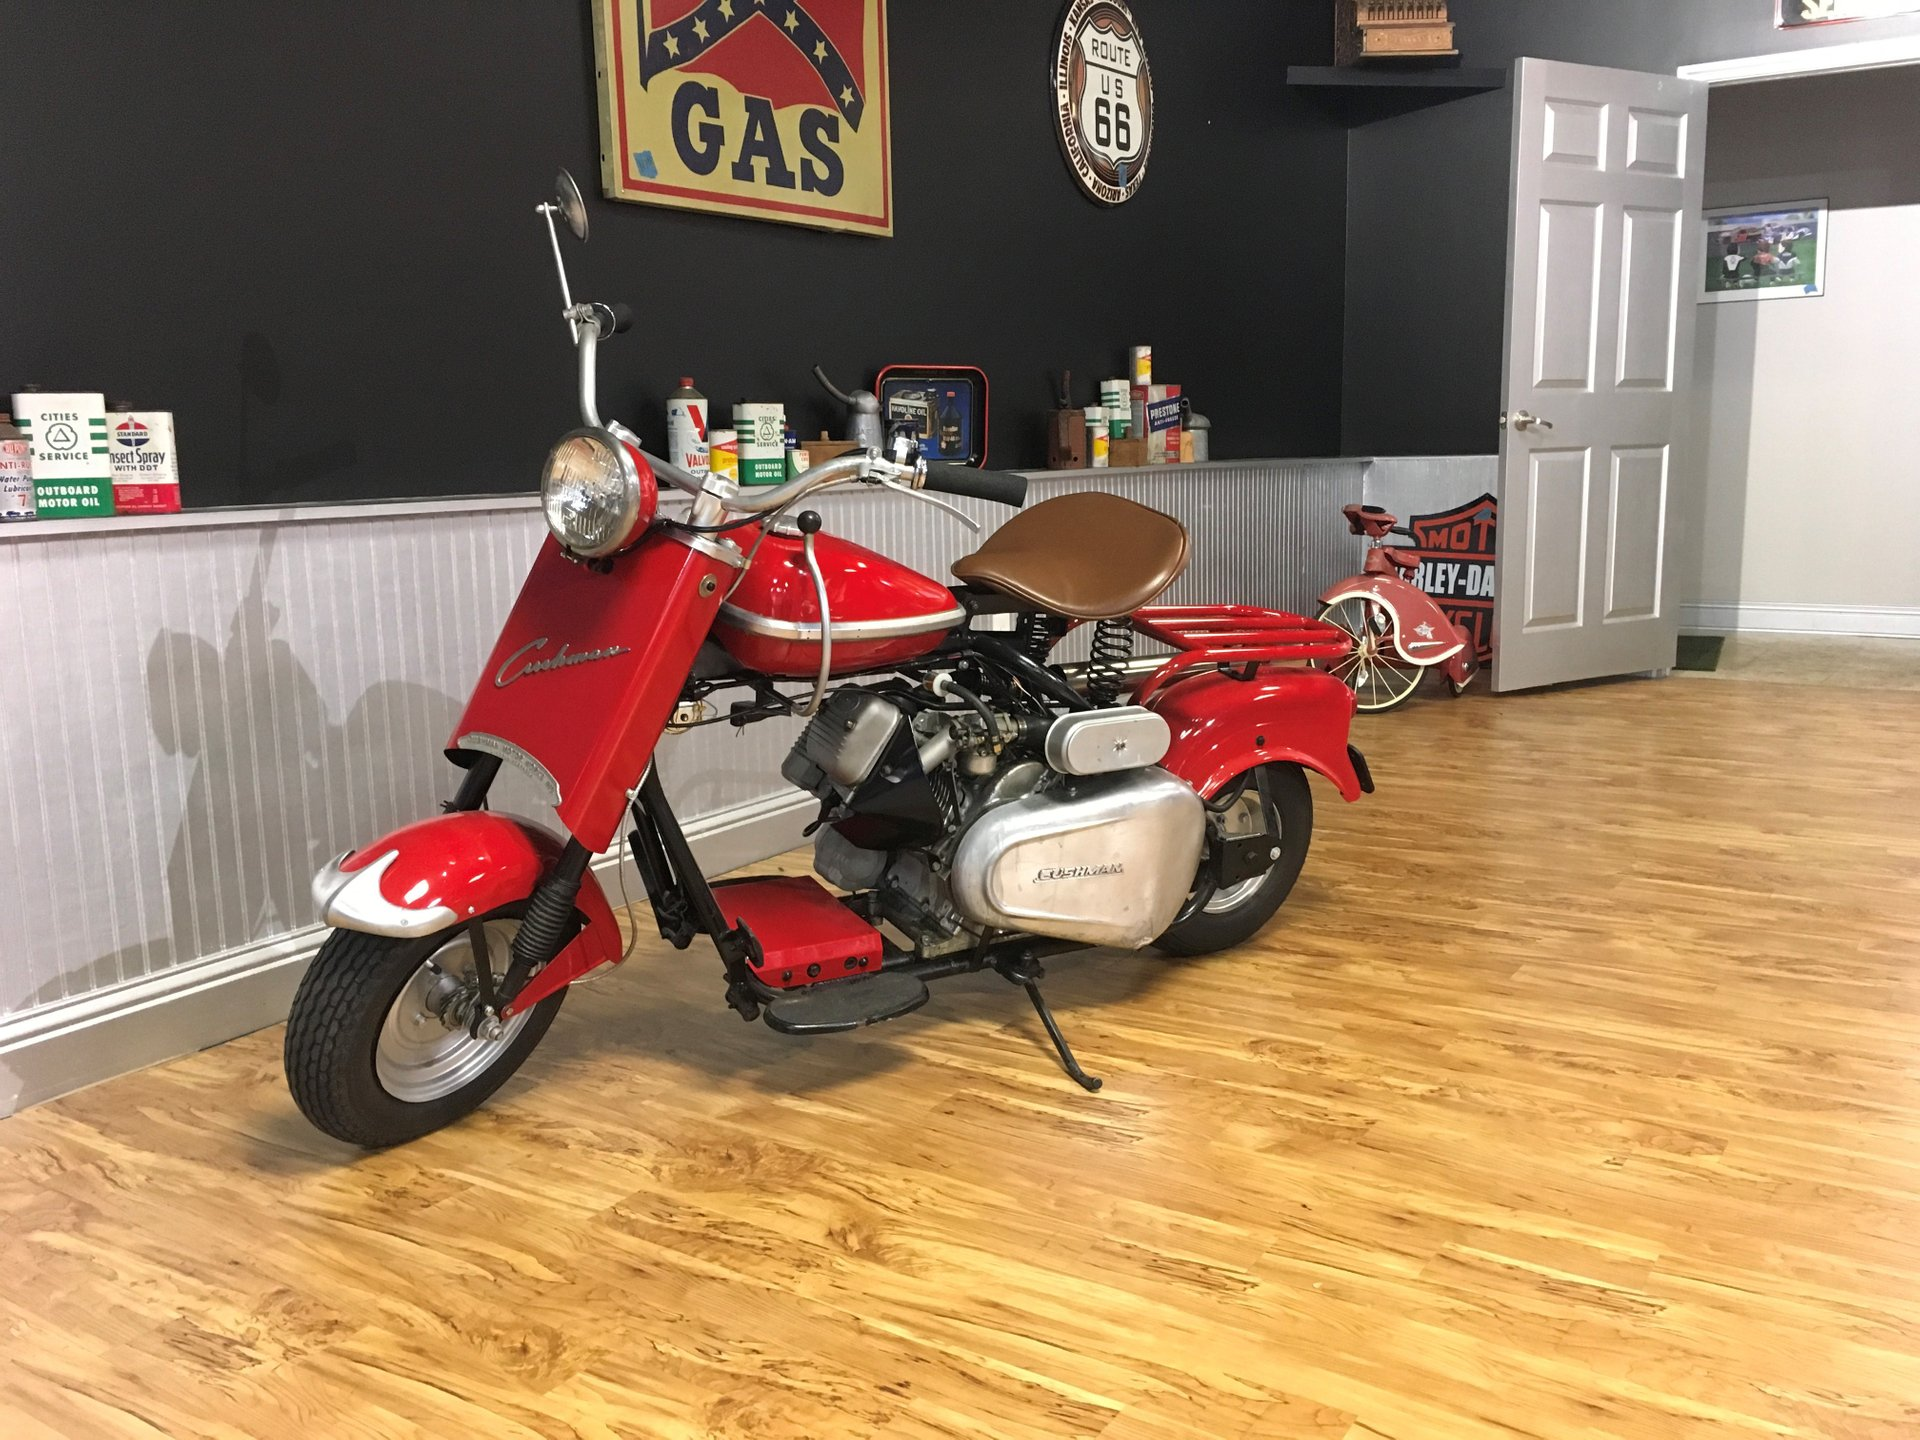 1964 cushman eagle scooter